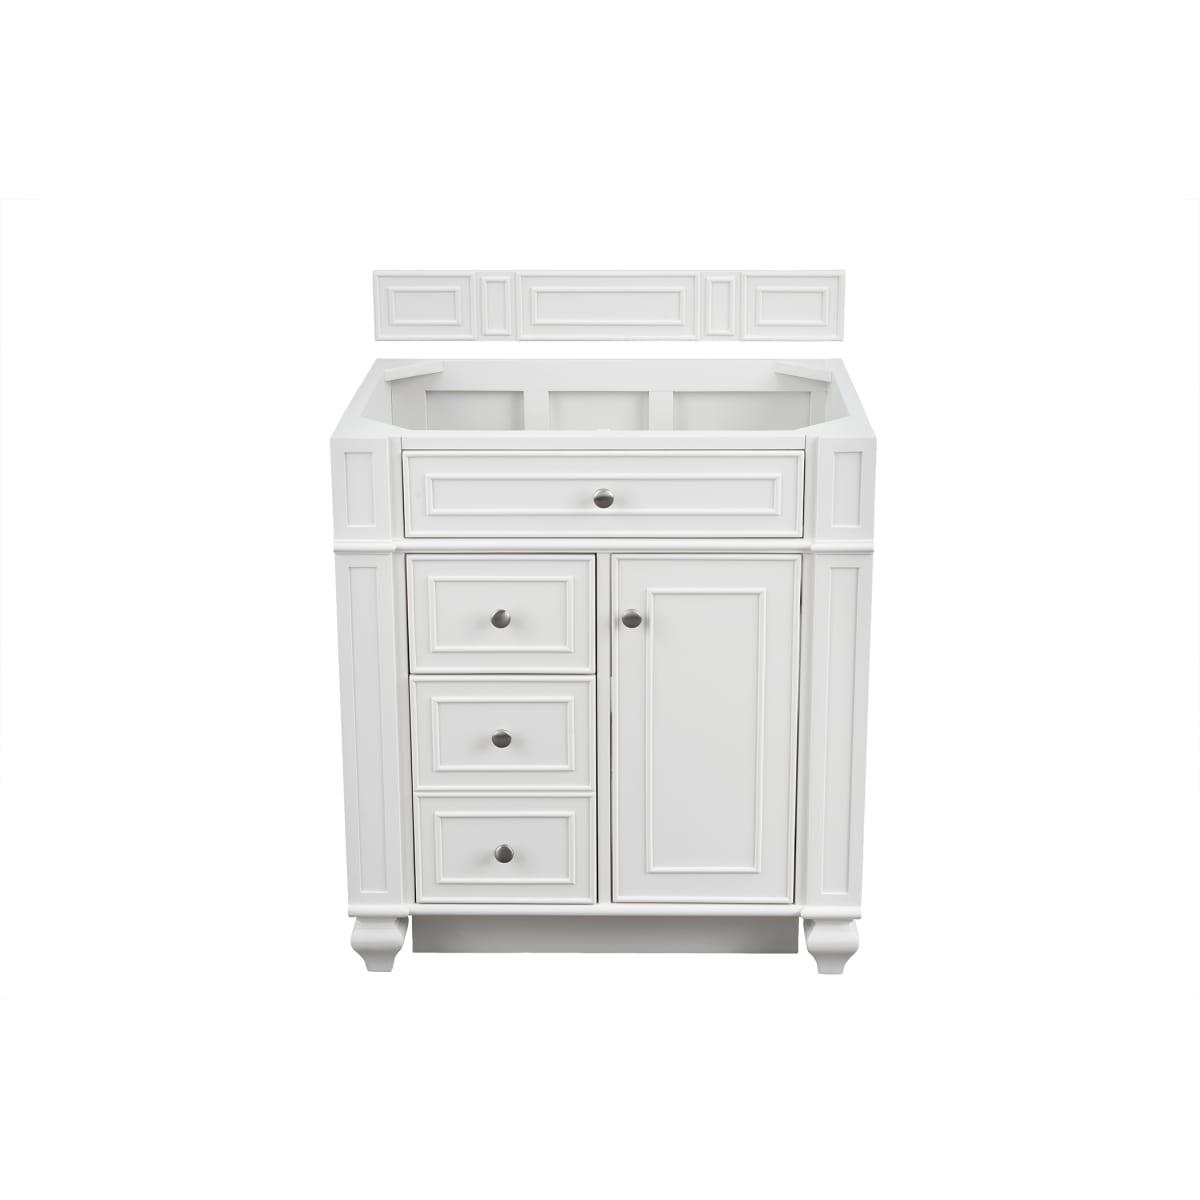 James Martin Vanities 157 V30 Bw 3gex Bright White Bristol 30 Single Basin Wood Vanity Set With Grey Expo Quartz Vanity Top Faucetdirect Com